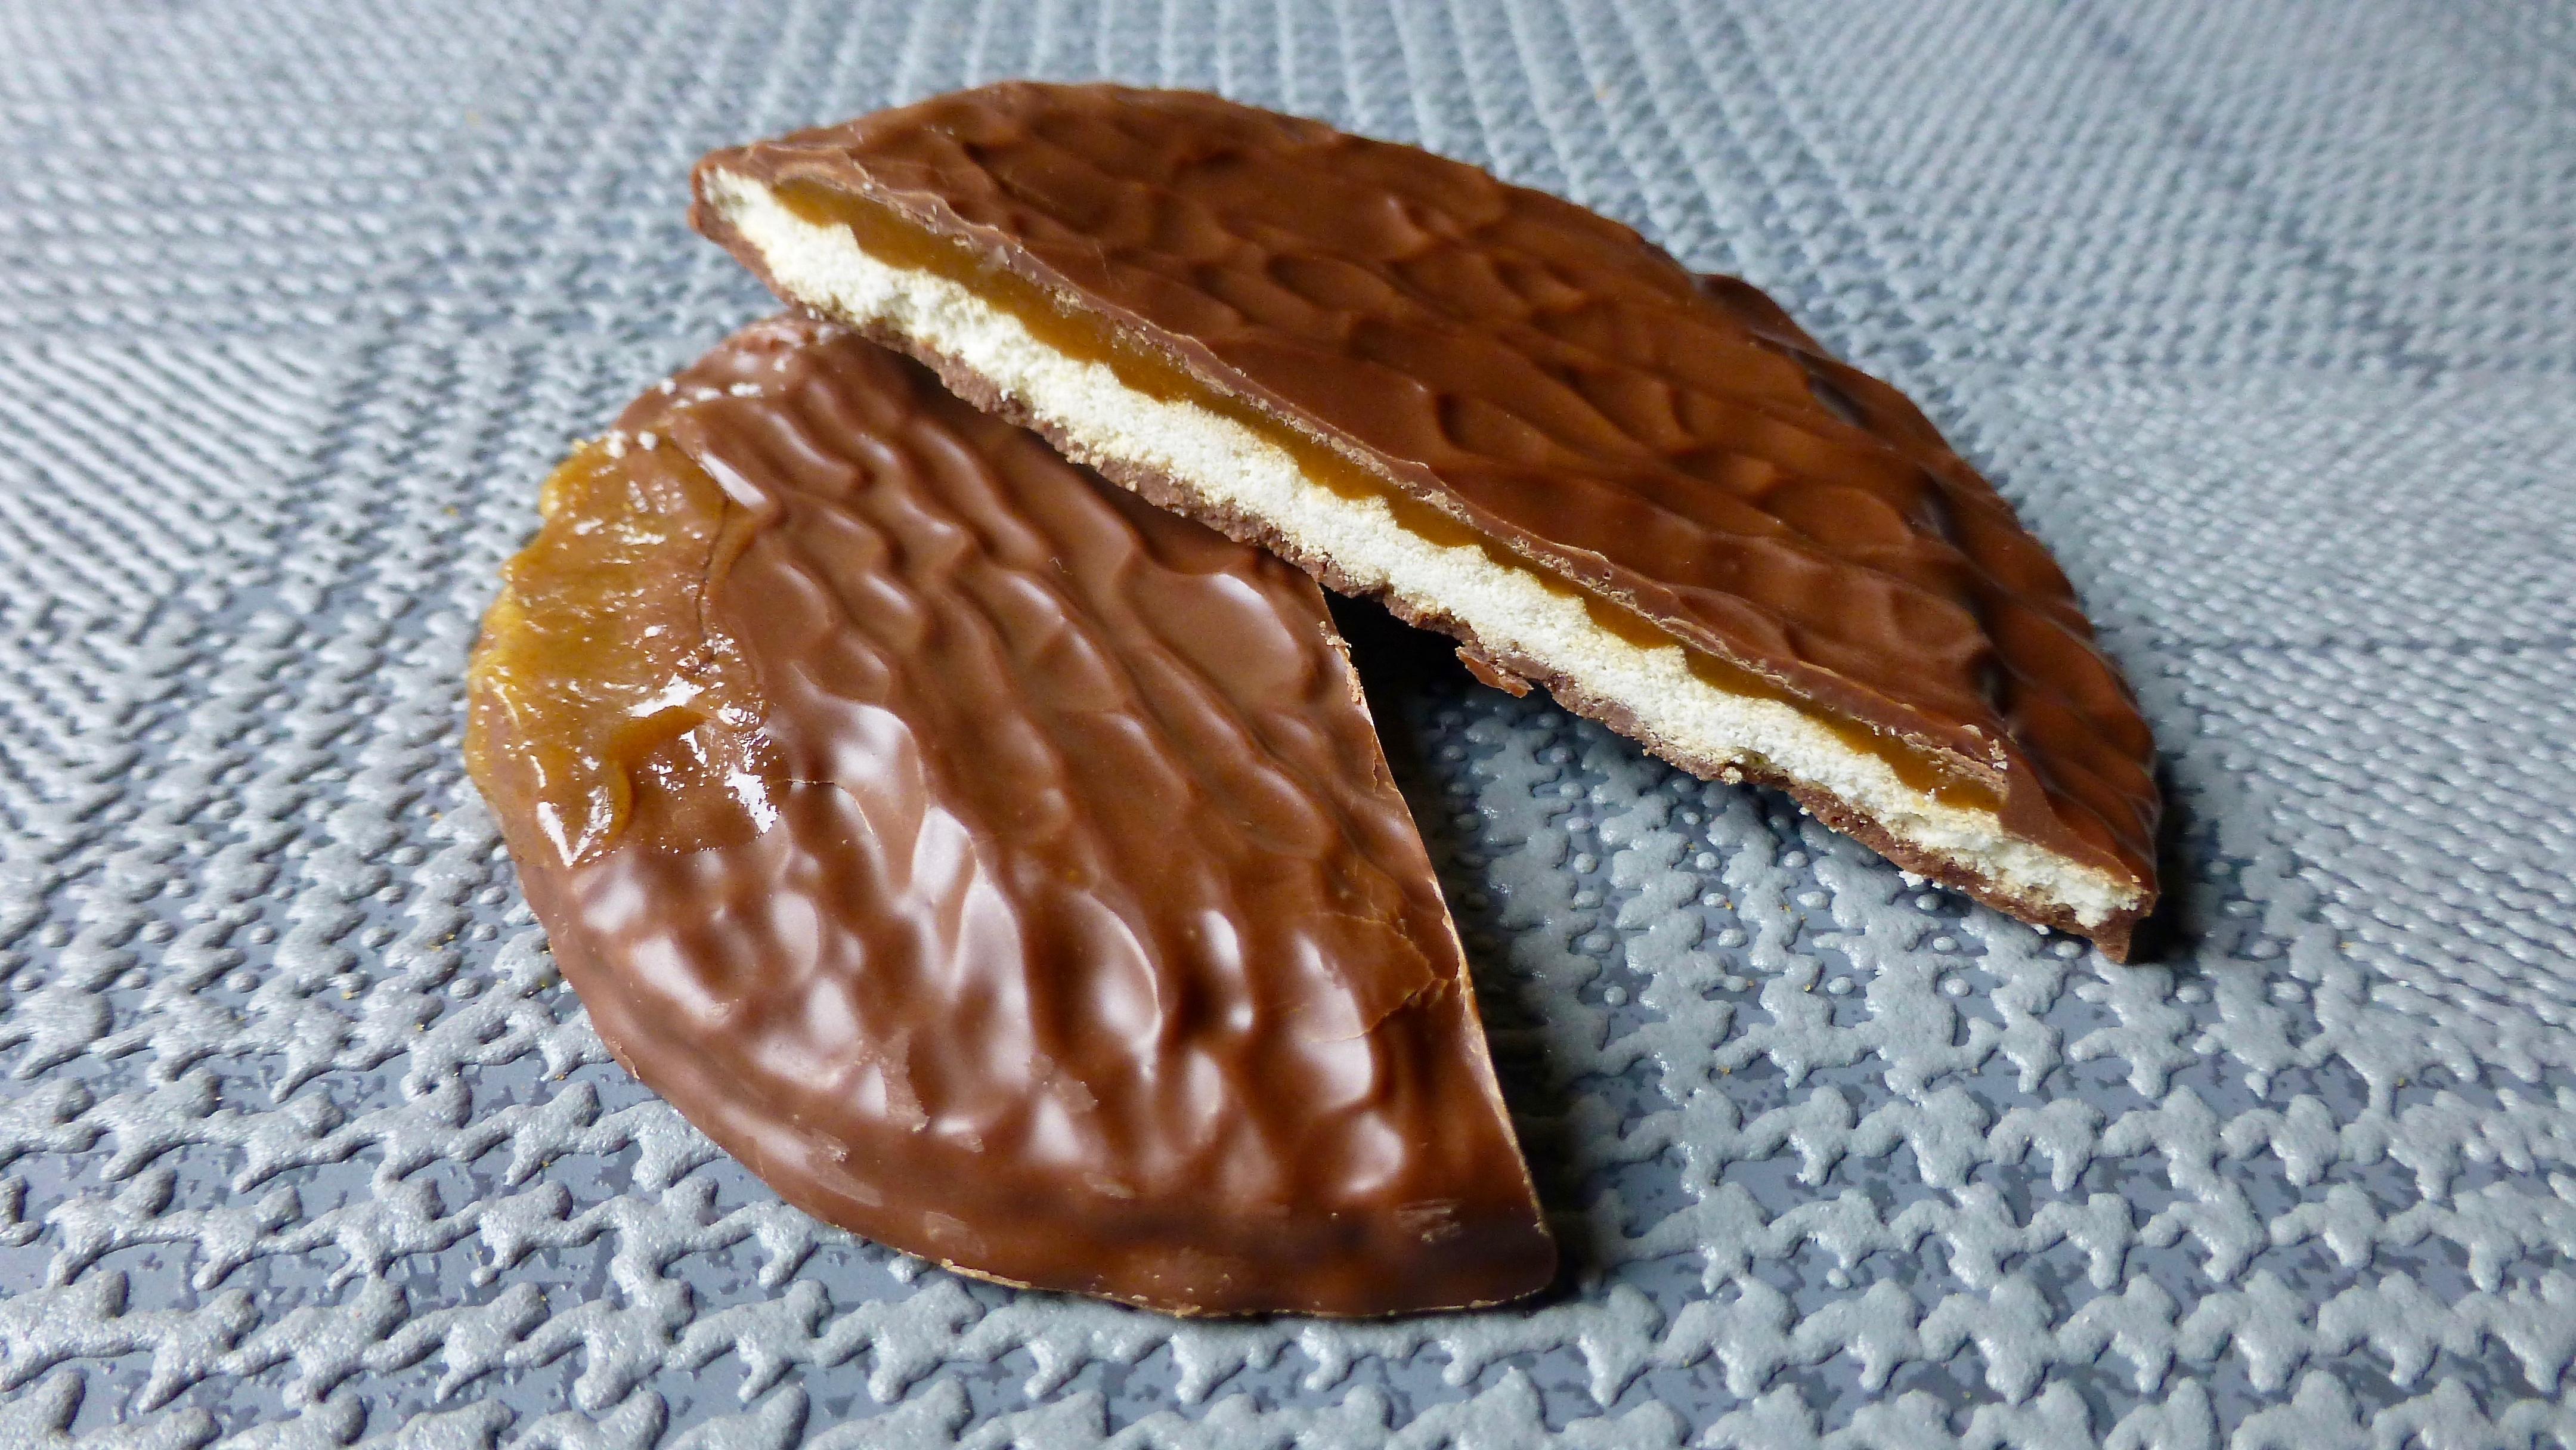 Belgian Boys Choco Stroopwafle